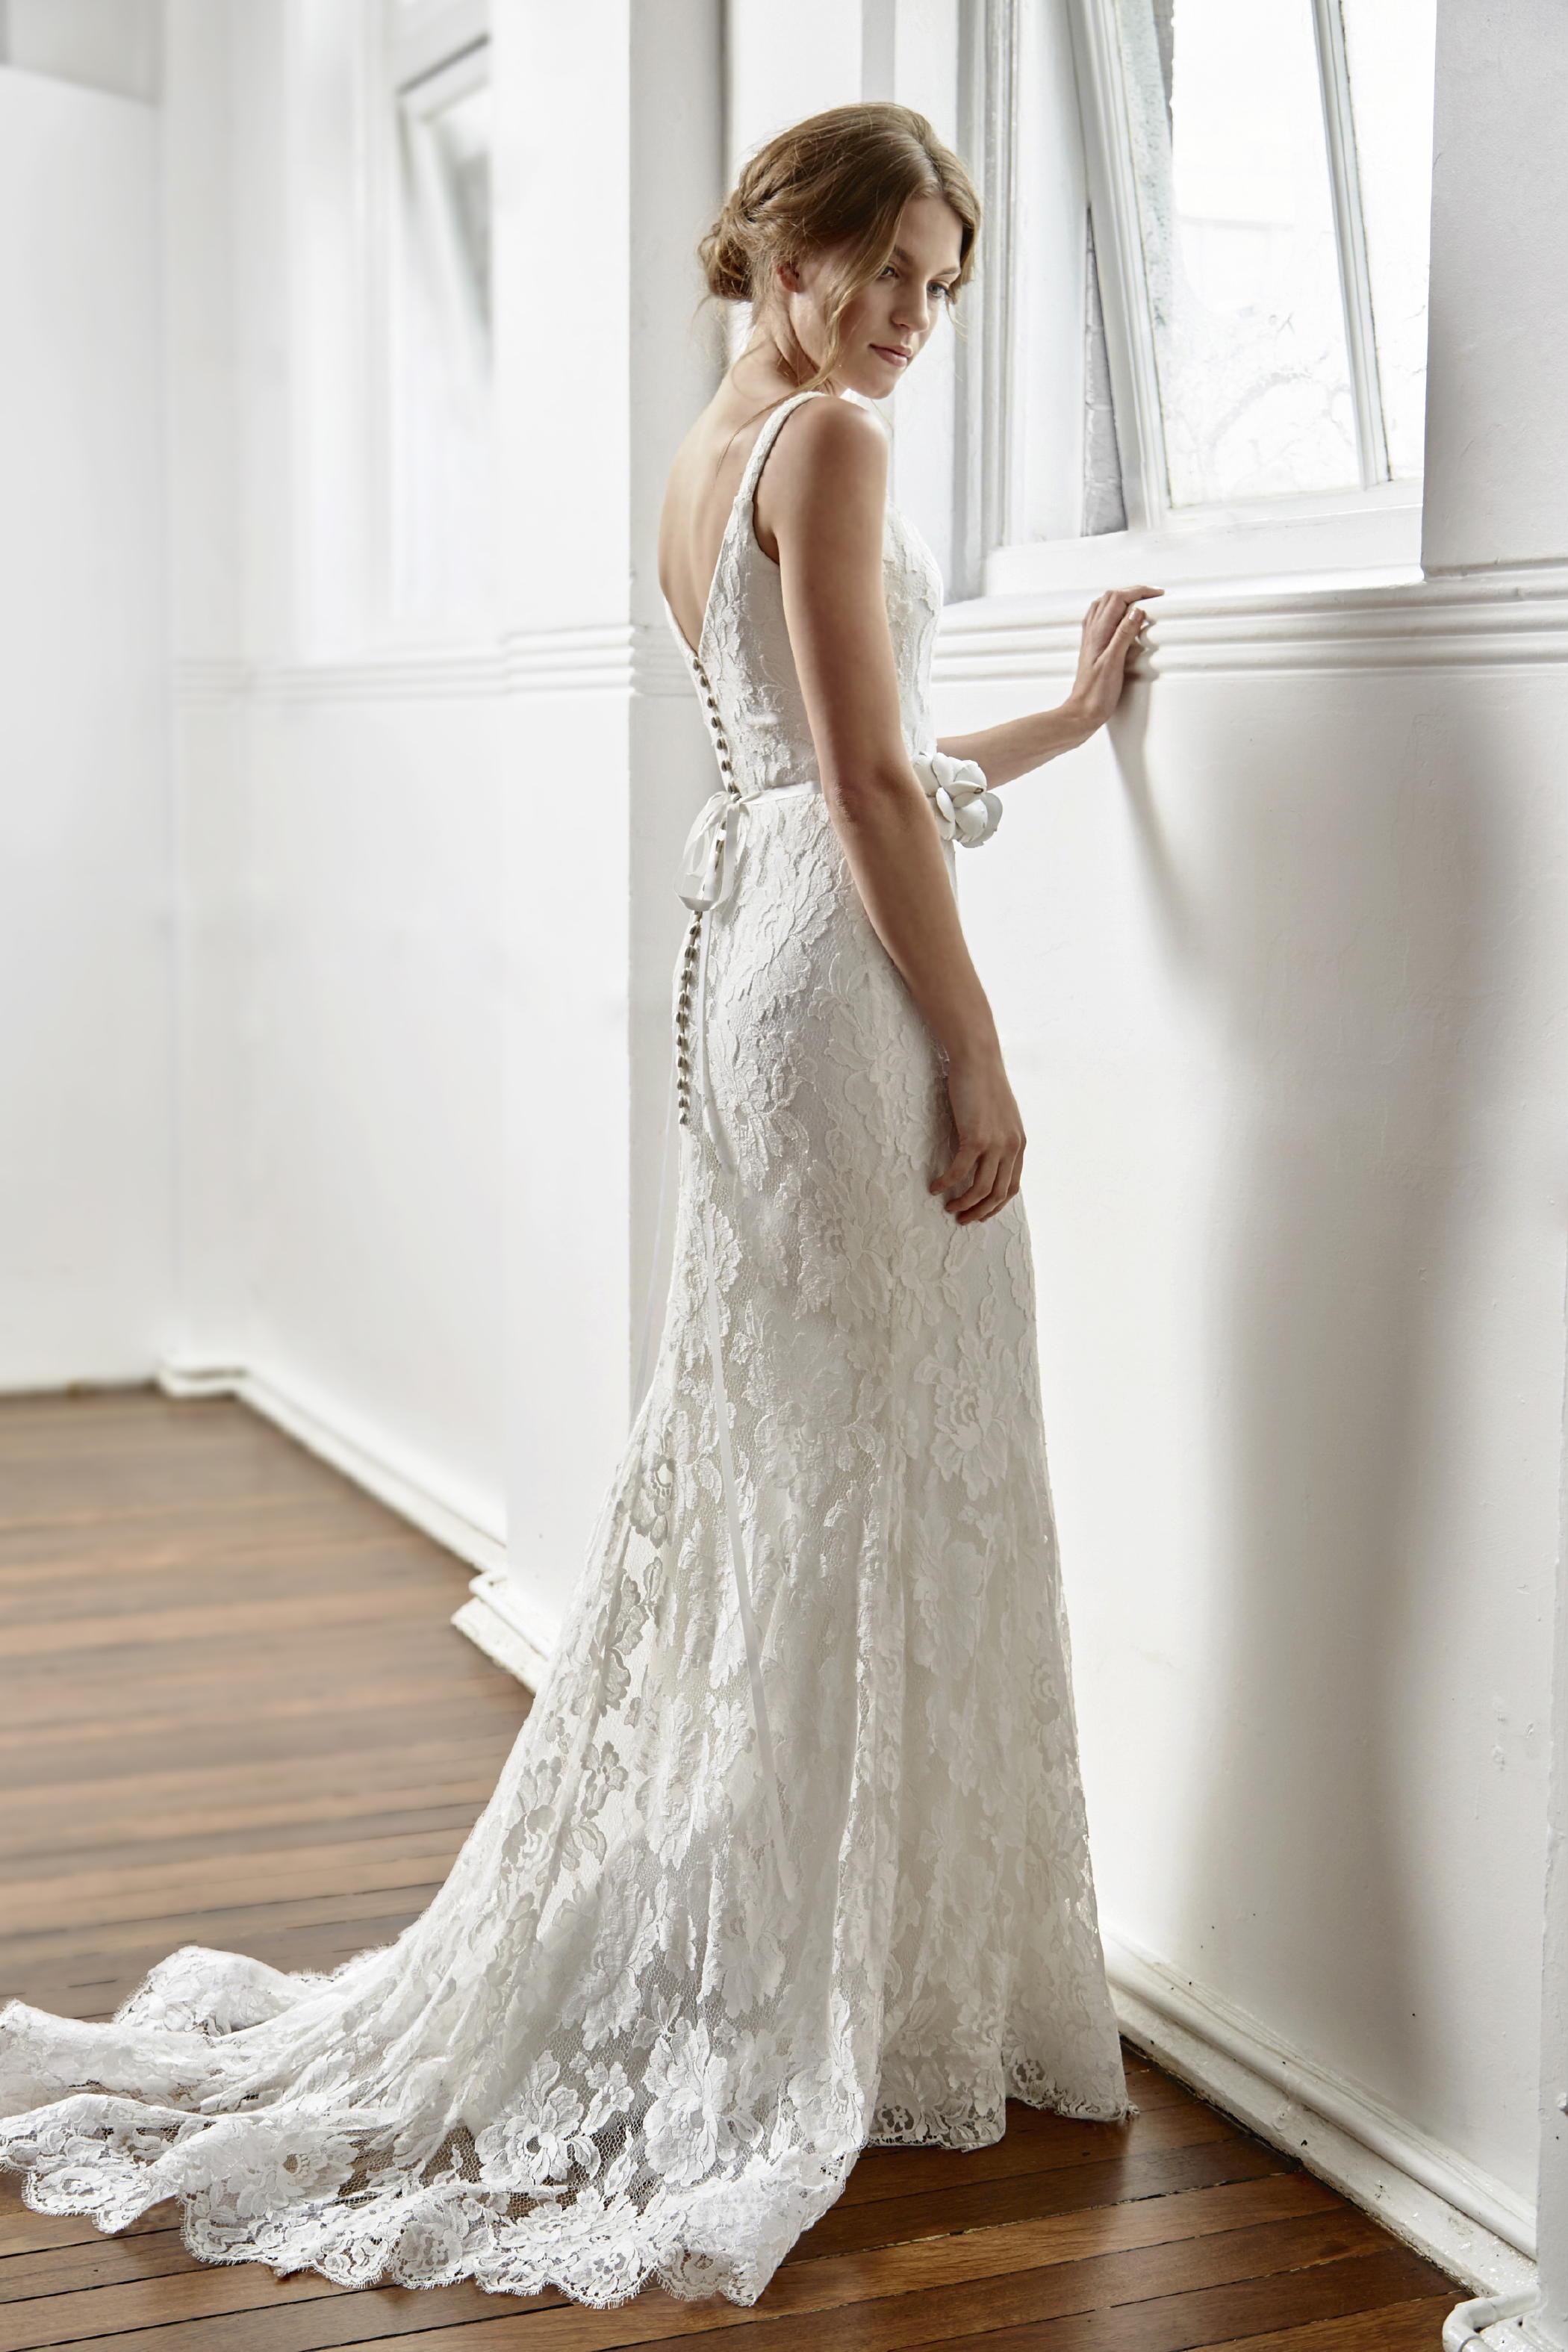 Summer Valentina summer bridal gown Tanya Anic Bridal photographyGrant Sparkes Carroll double bay sydney bridal_032 (2).jpg